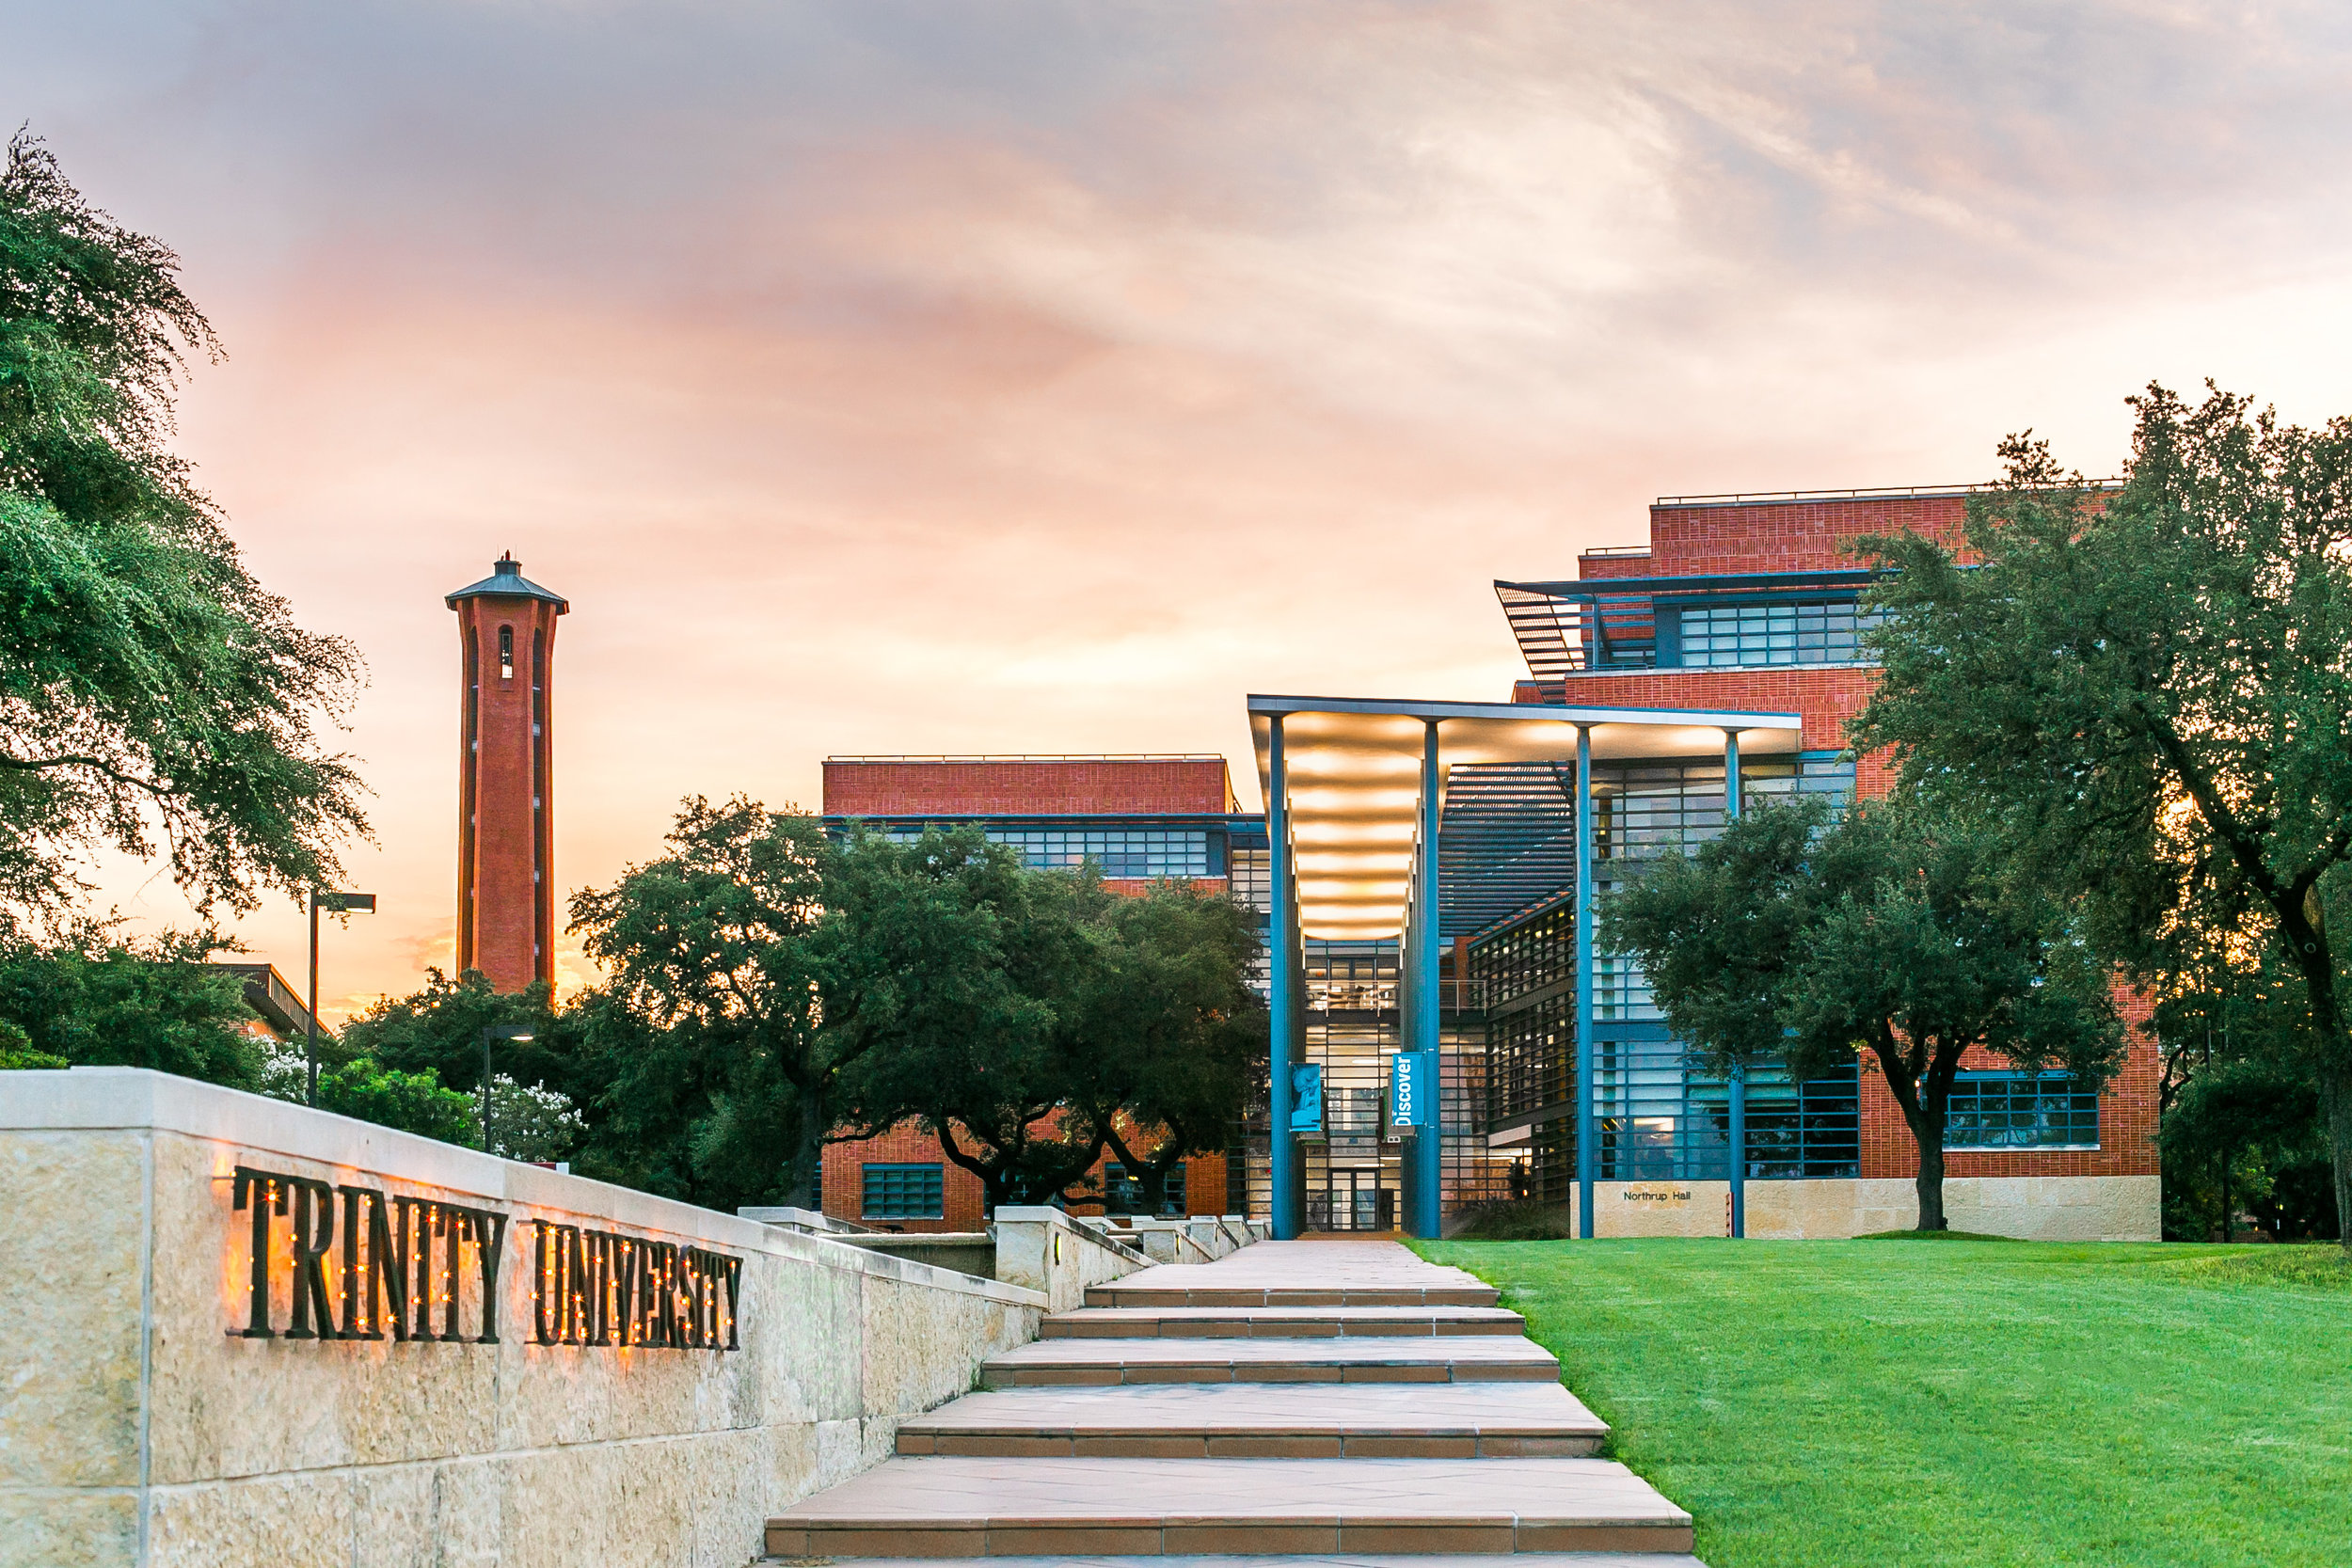 TrinityUniversity.jpg